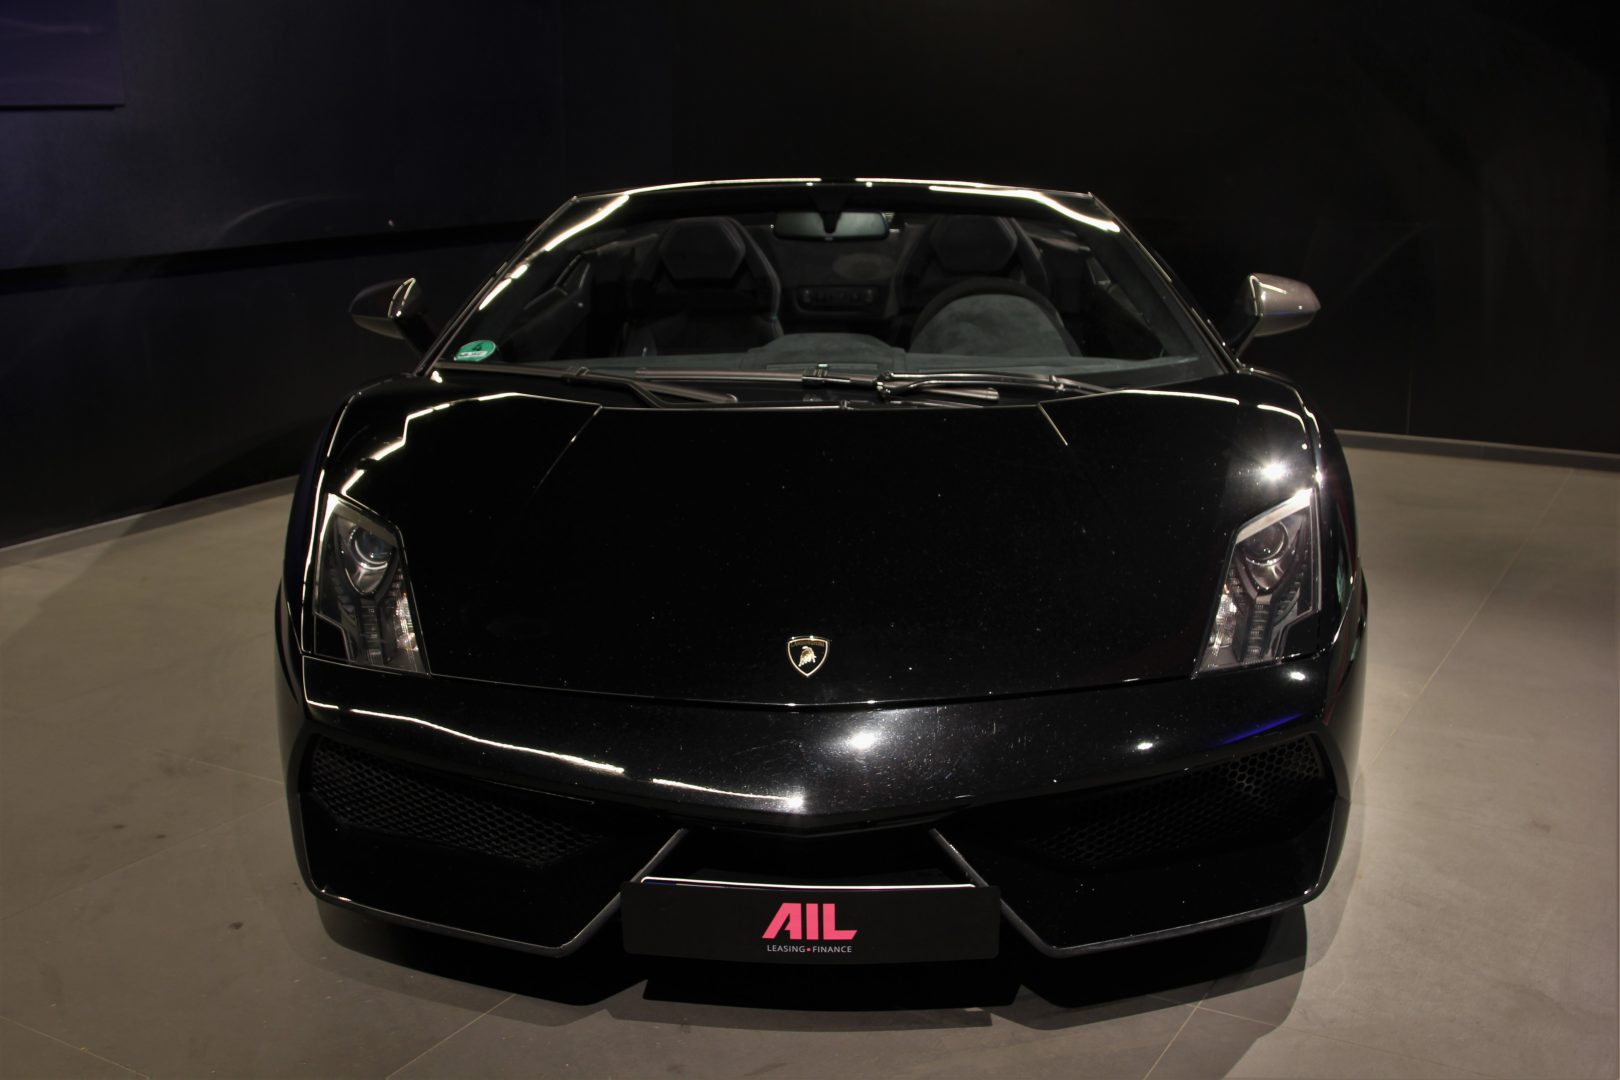 AIL Lamborghini Gallardo LP570-4 Performante Spyder 12